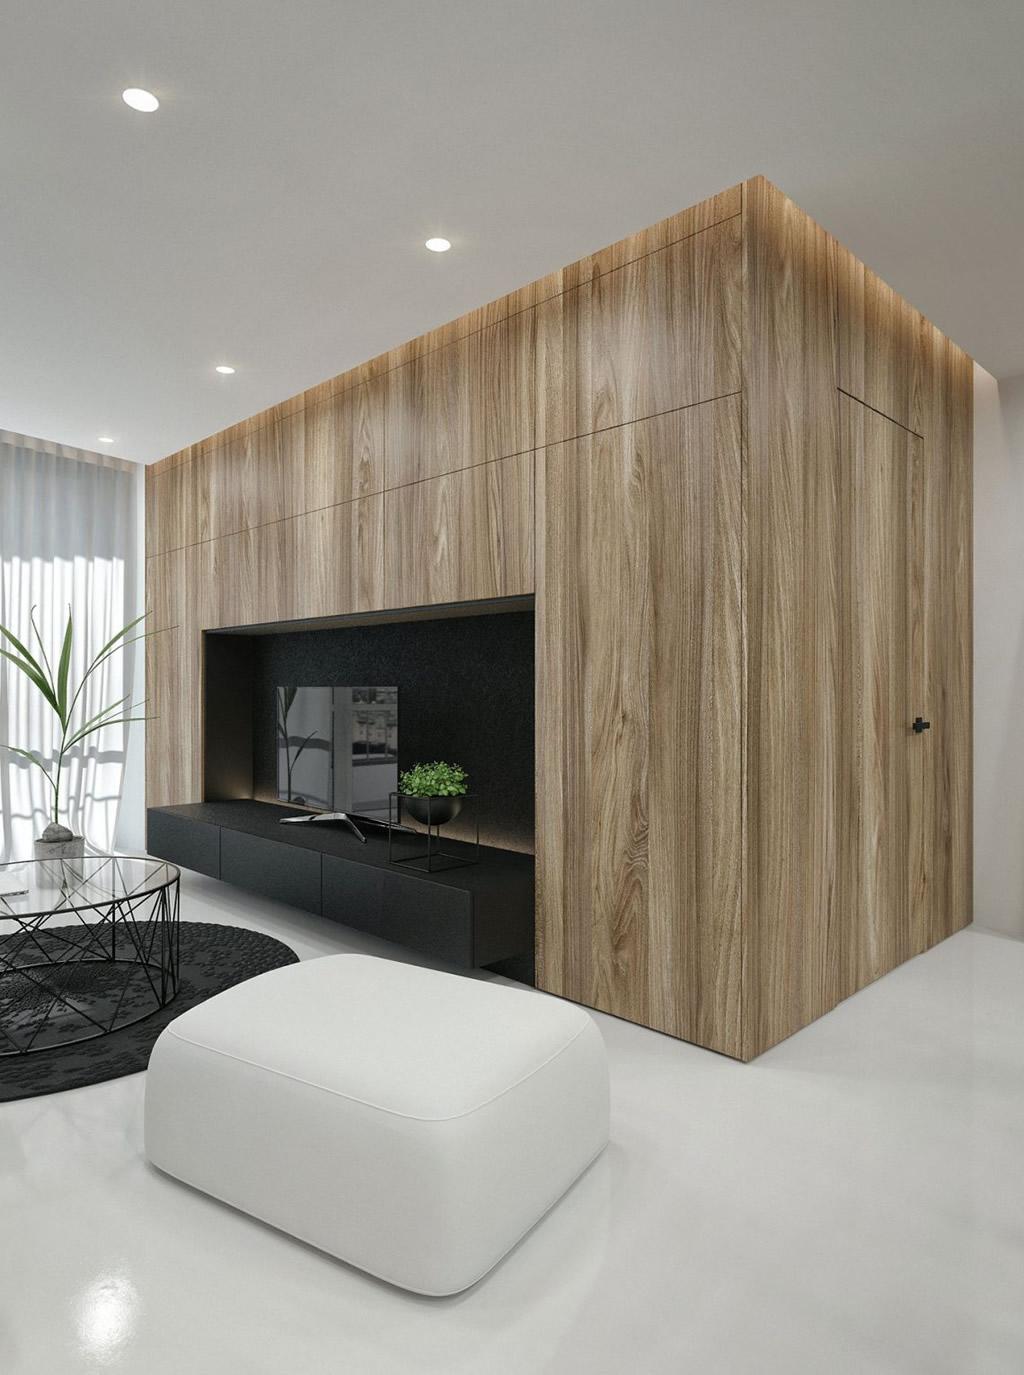 Cozy Modern Apartment In Kaunas, Lithuania 5